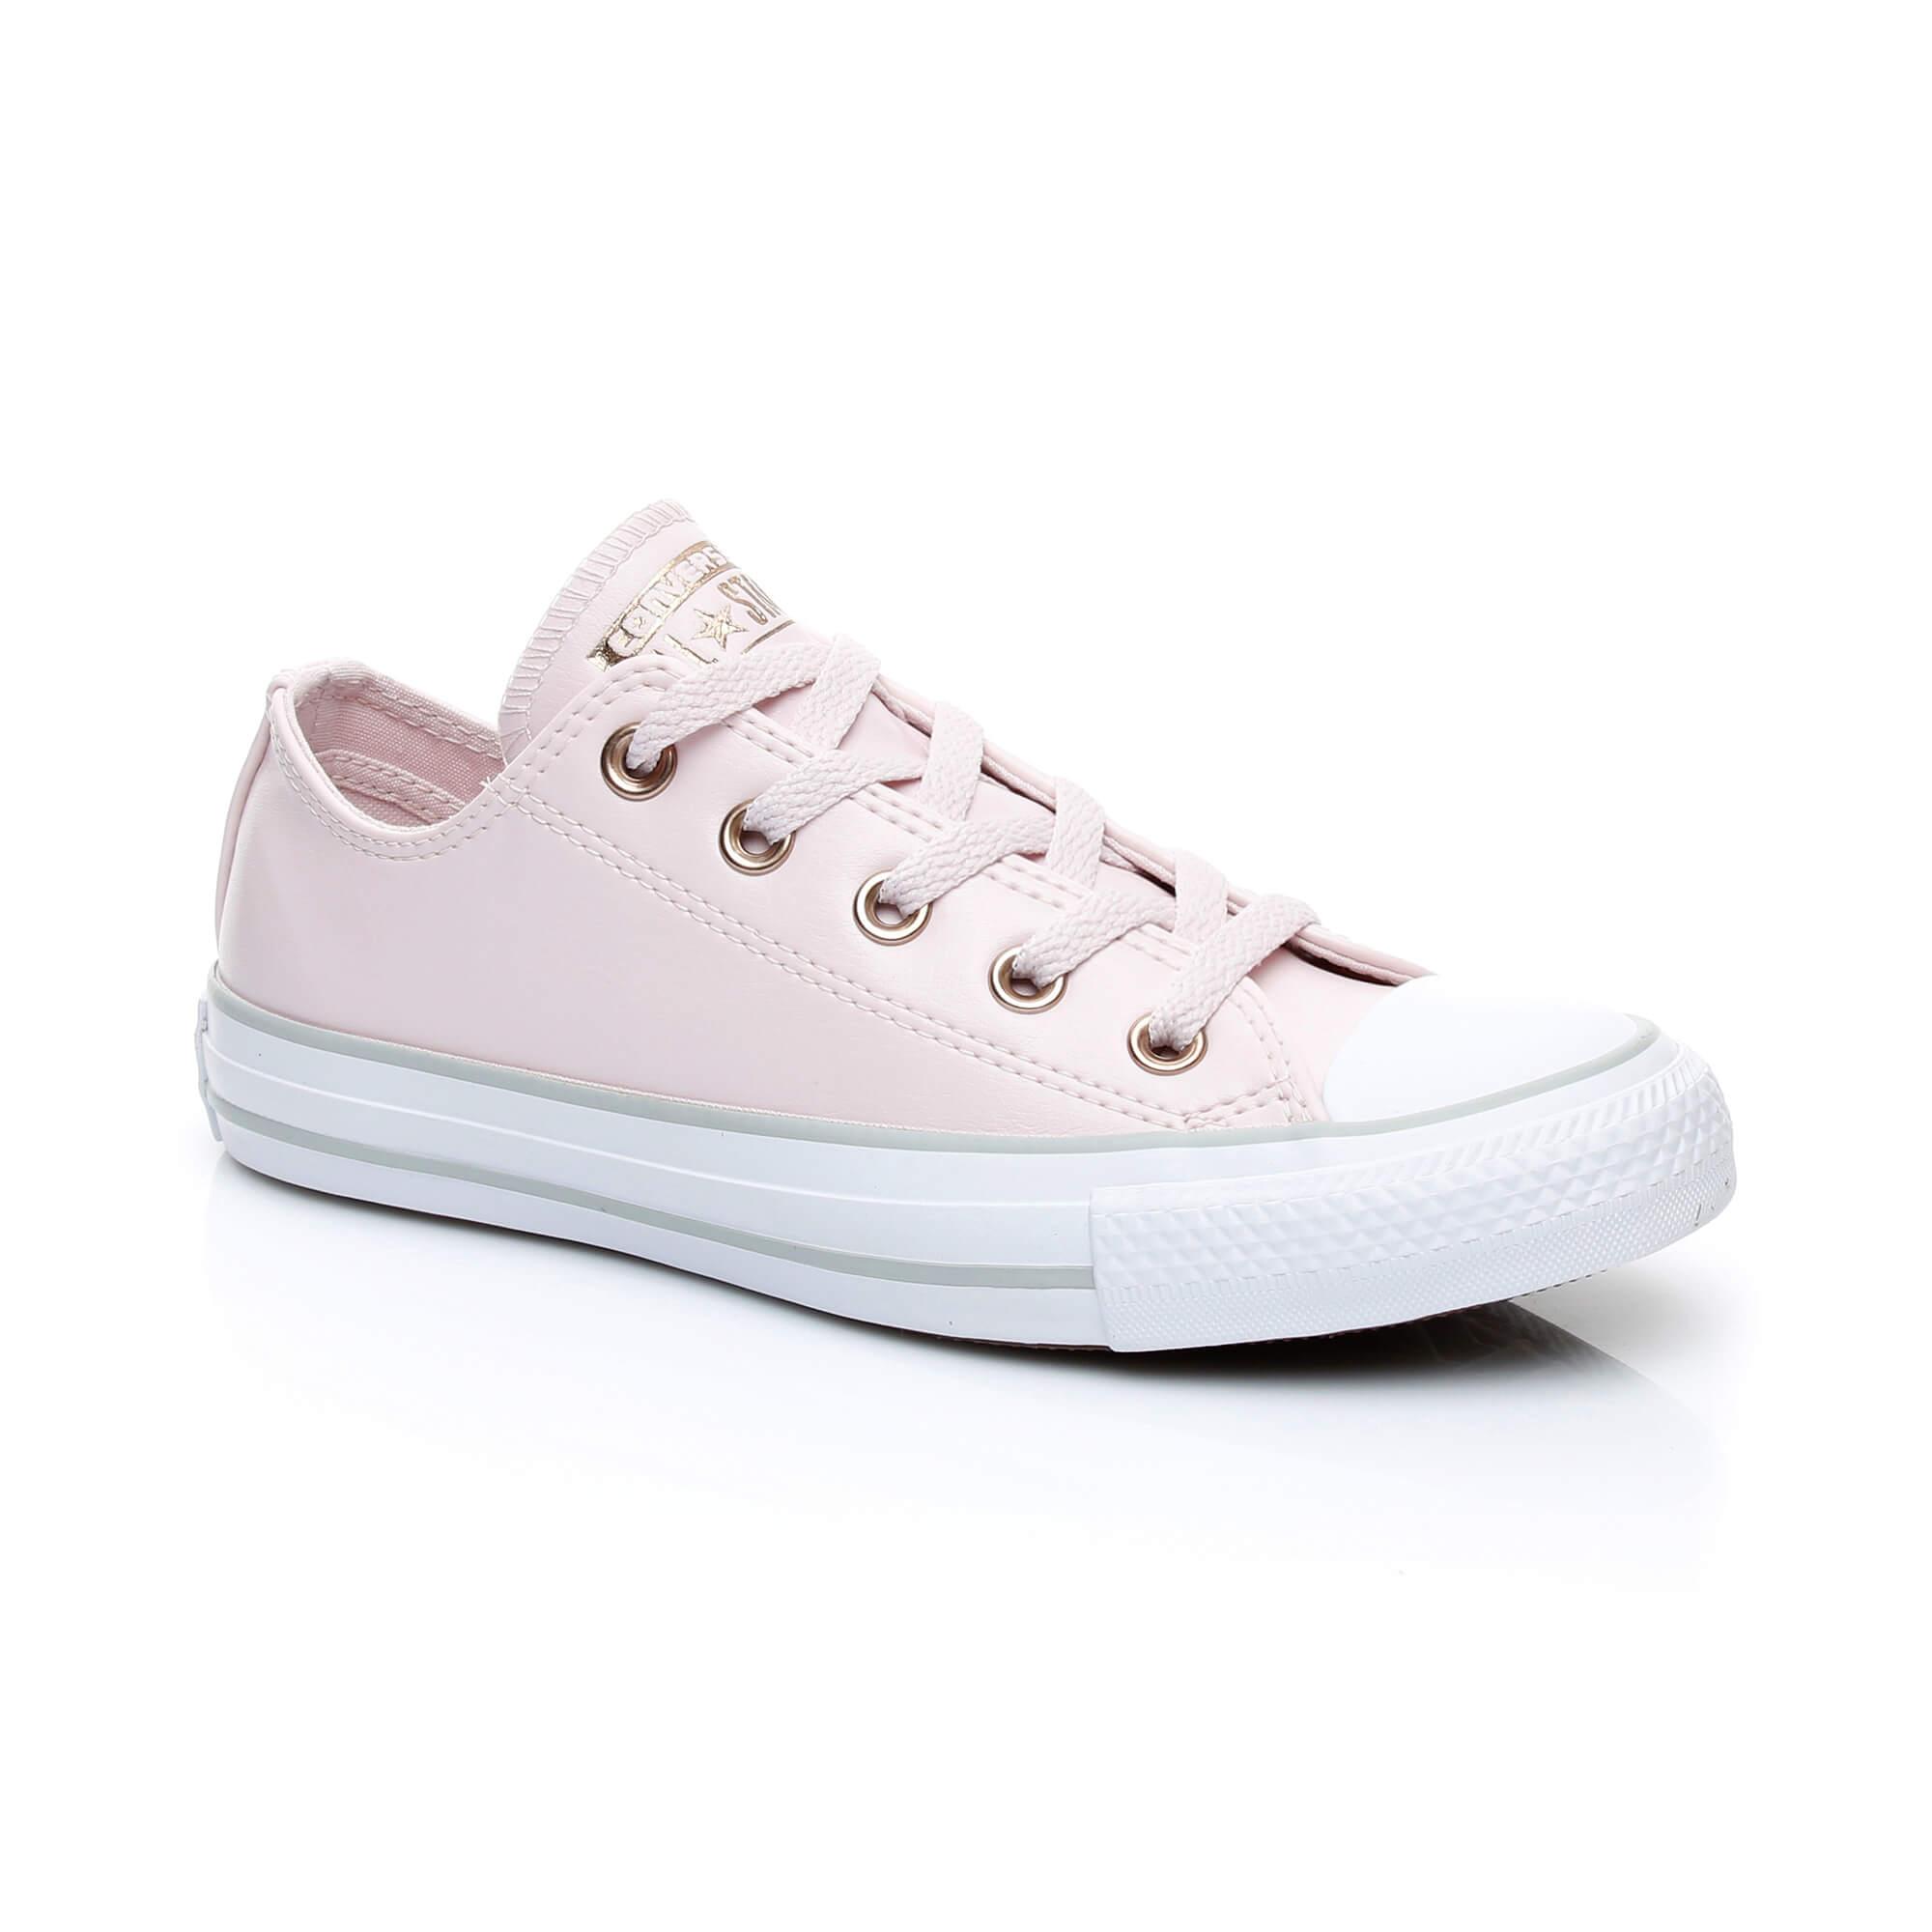 Converse Chuck Taylor Kadın Pembe Sneaker